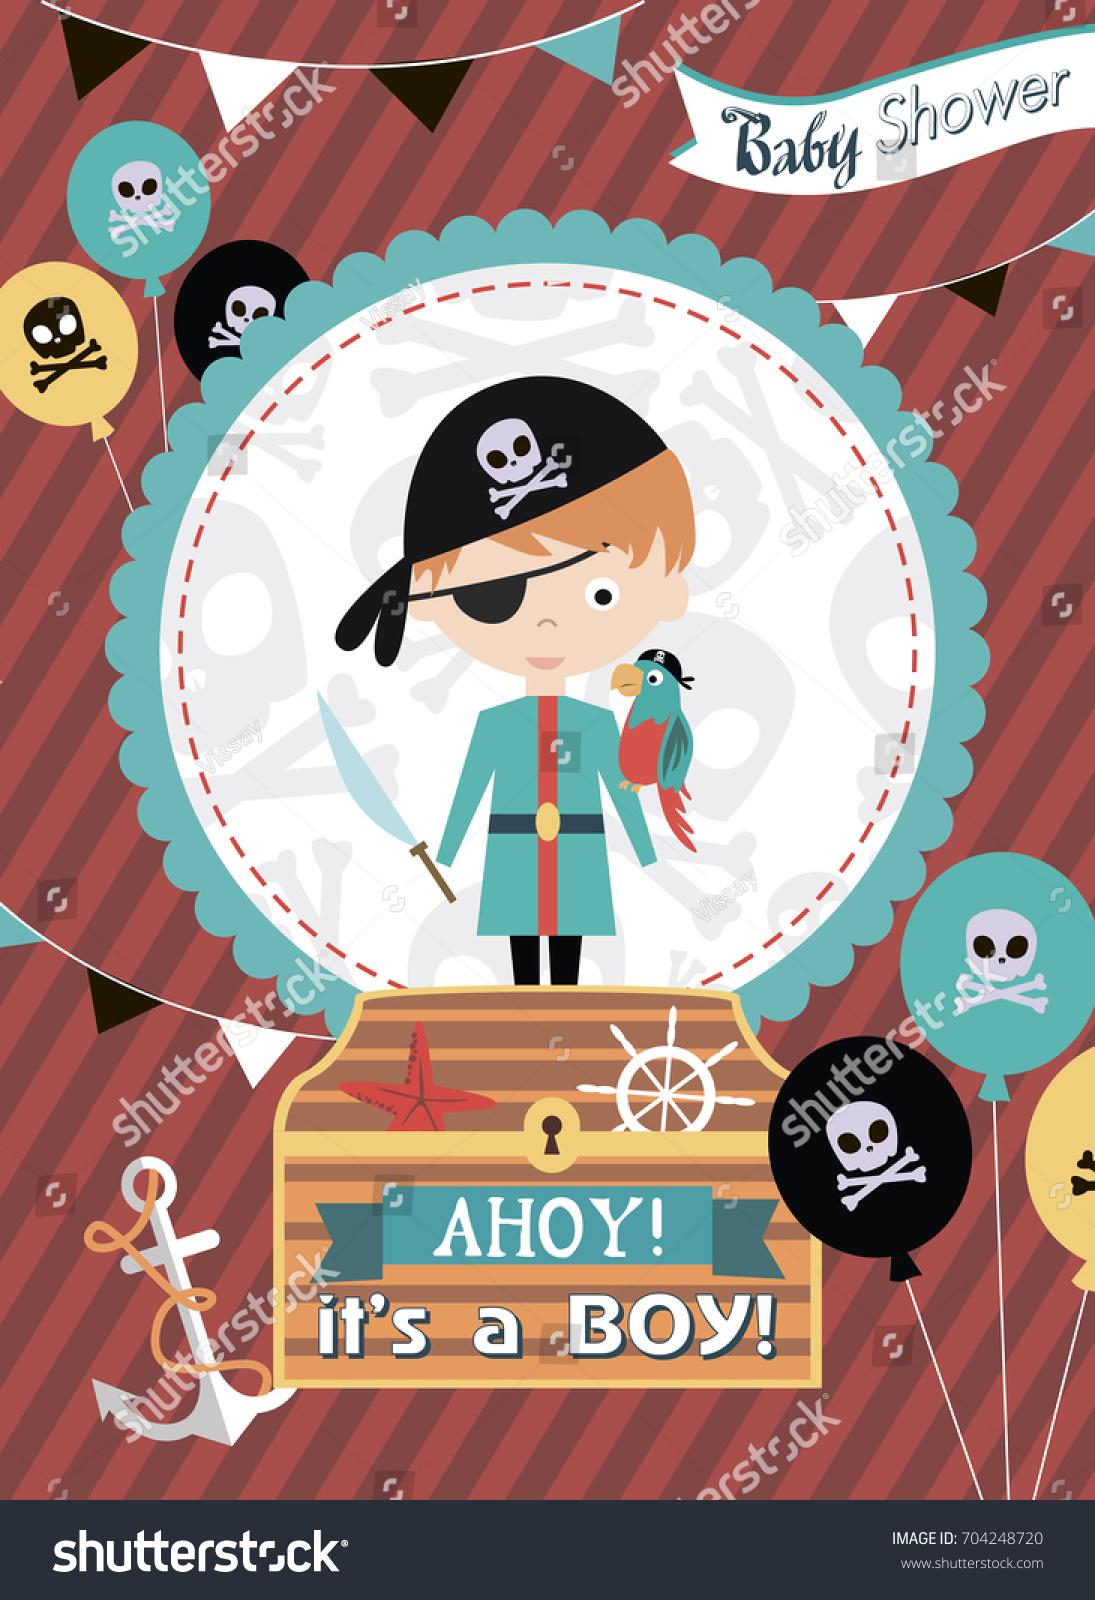 100+ [ Ahoy Baby Boy Shower Invitations ] | Ahoy Its A Boy Baby ...